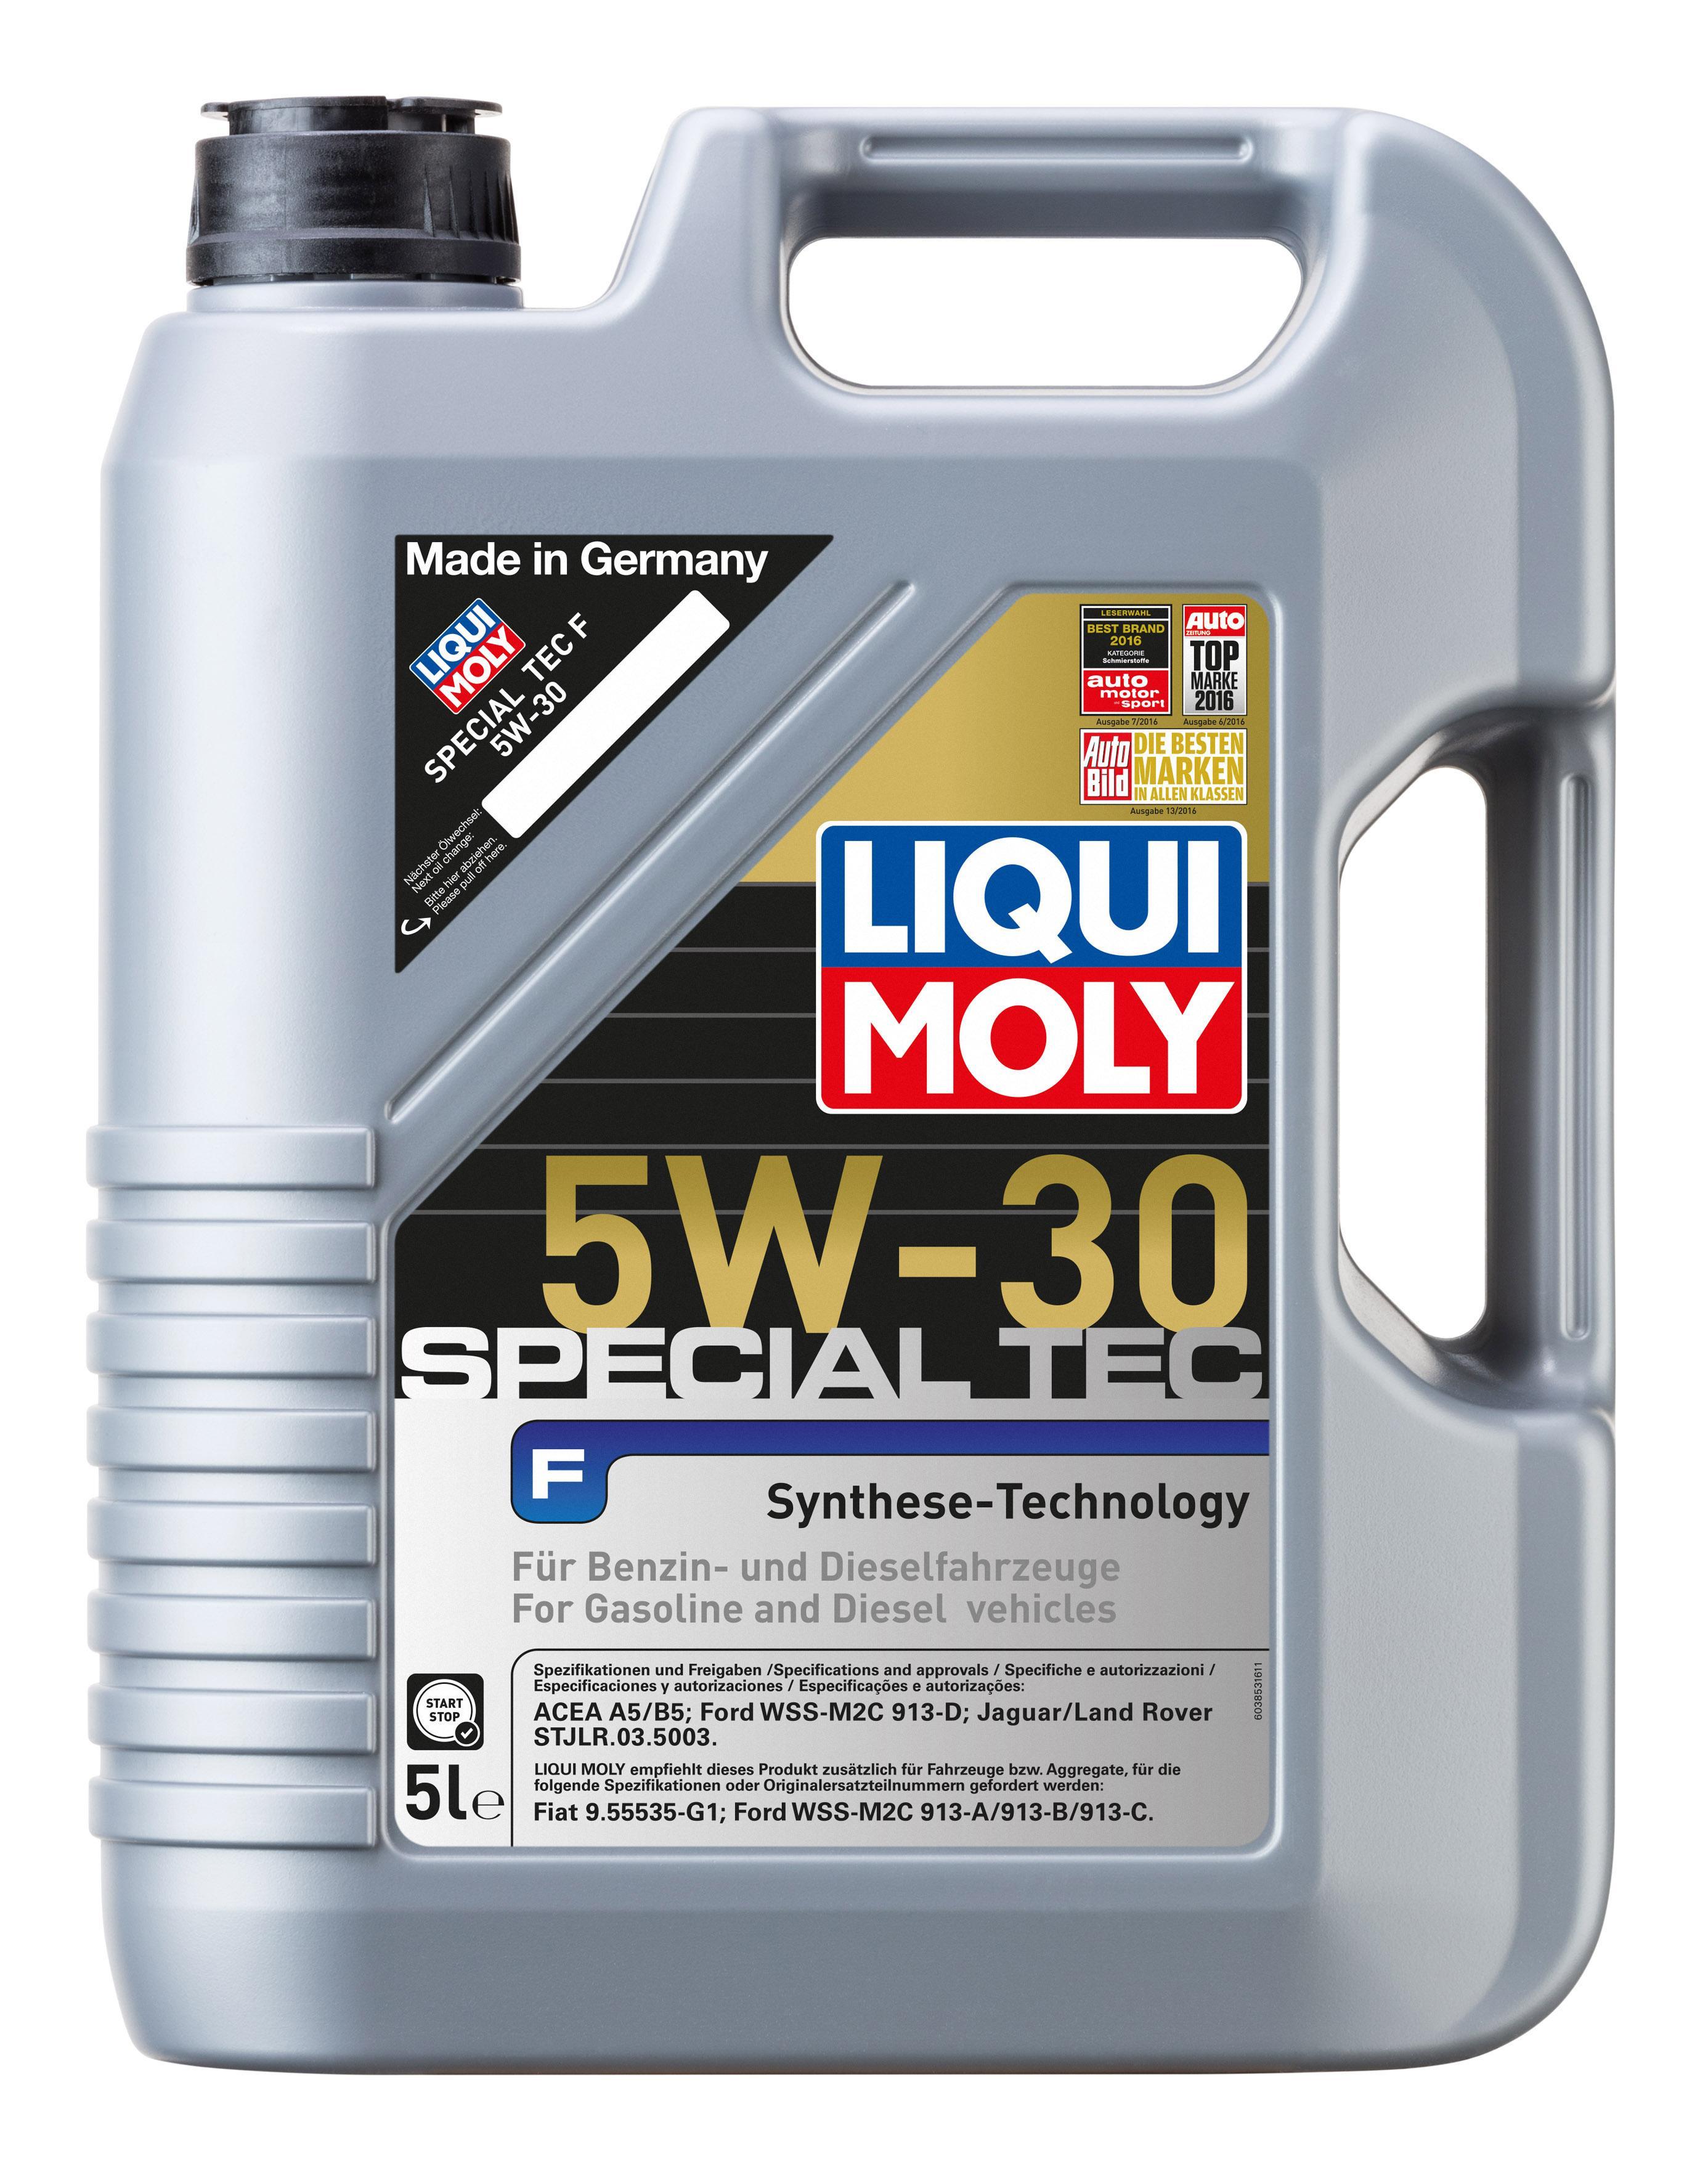 SpecialTecF5W30 LIQUI MOLY Special Tec, F 5W-30, 5W-30, 5l, Synthetiköl Motoröl 3853 günstig kaufen